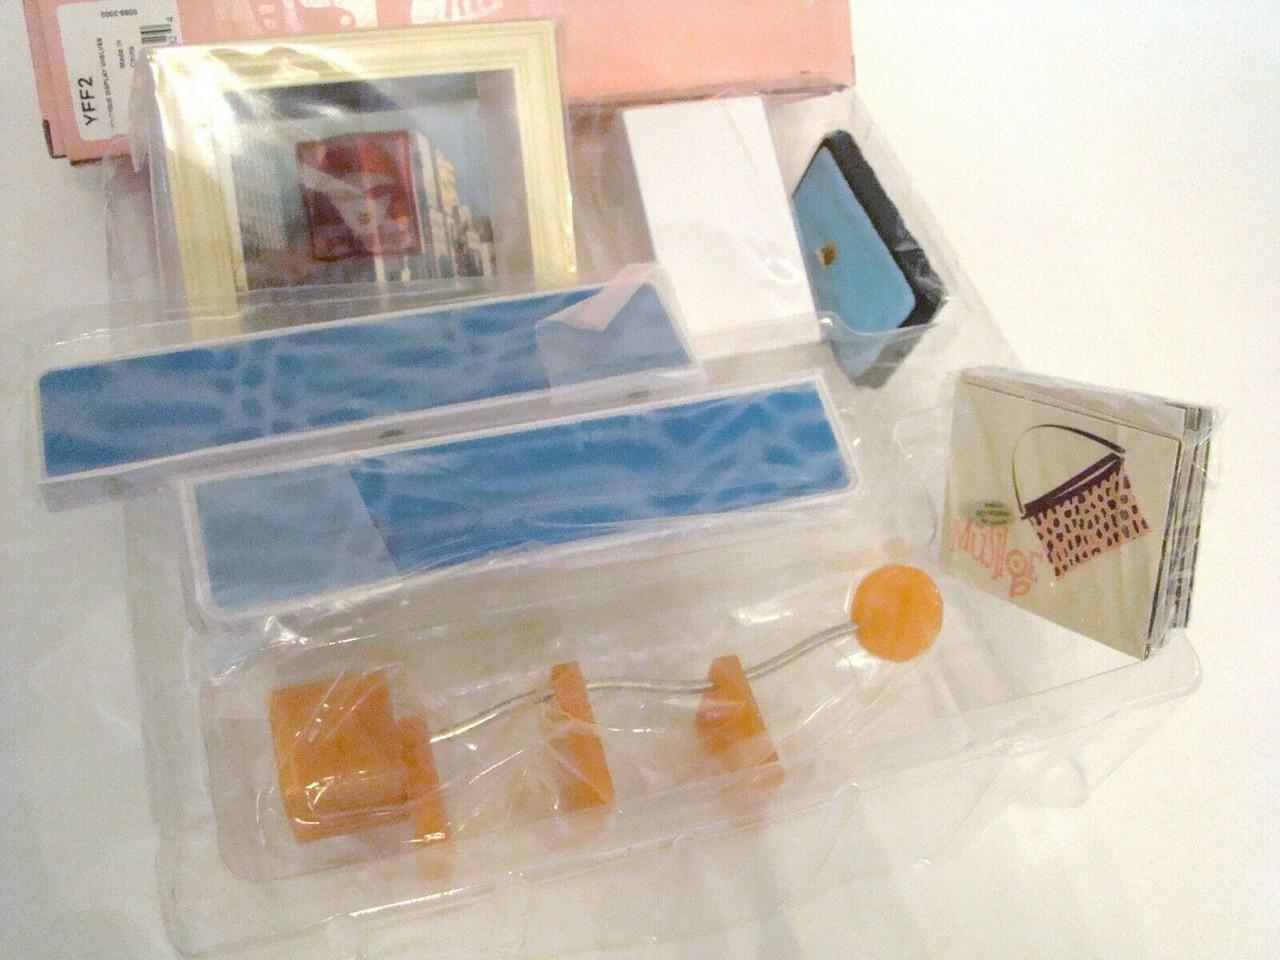 American Girl AG Mini Boutique DISPLAY SHELVES Boxed Set YFF2